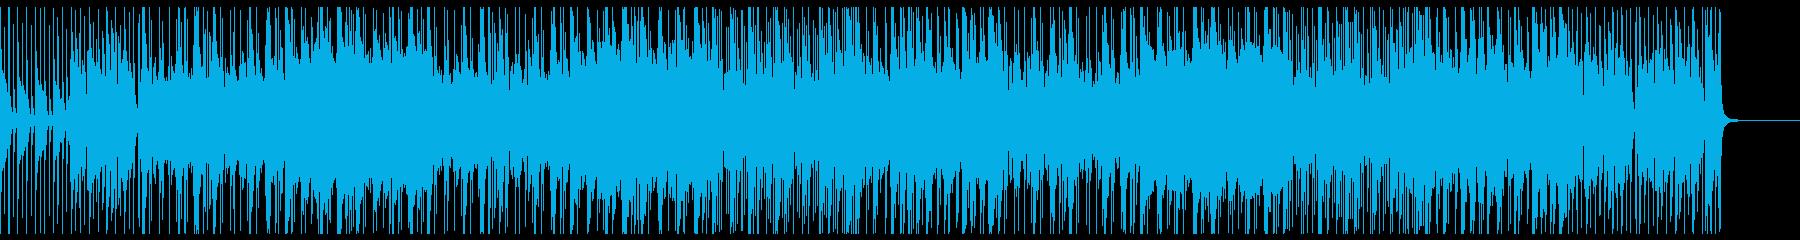 Wリポートを喚起させる浮遊感のあるジャズの再生済みの波形